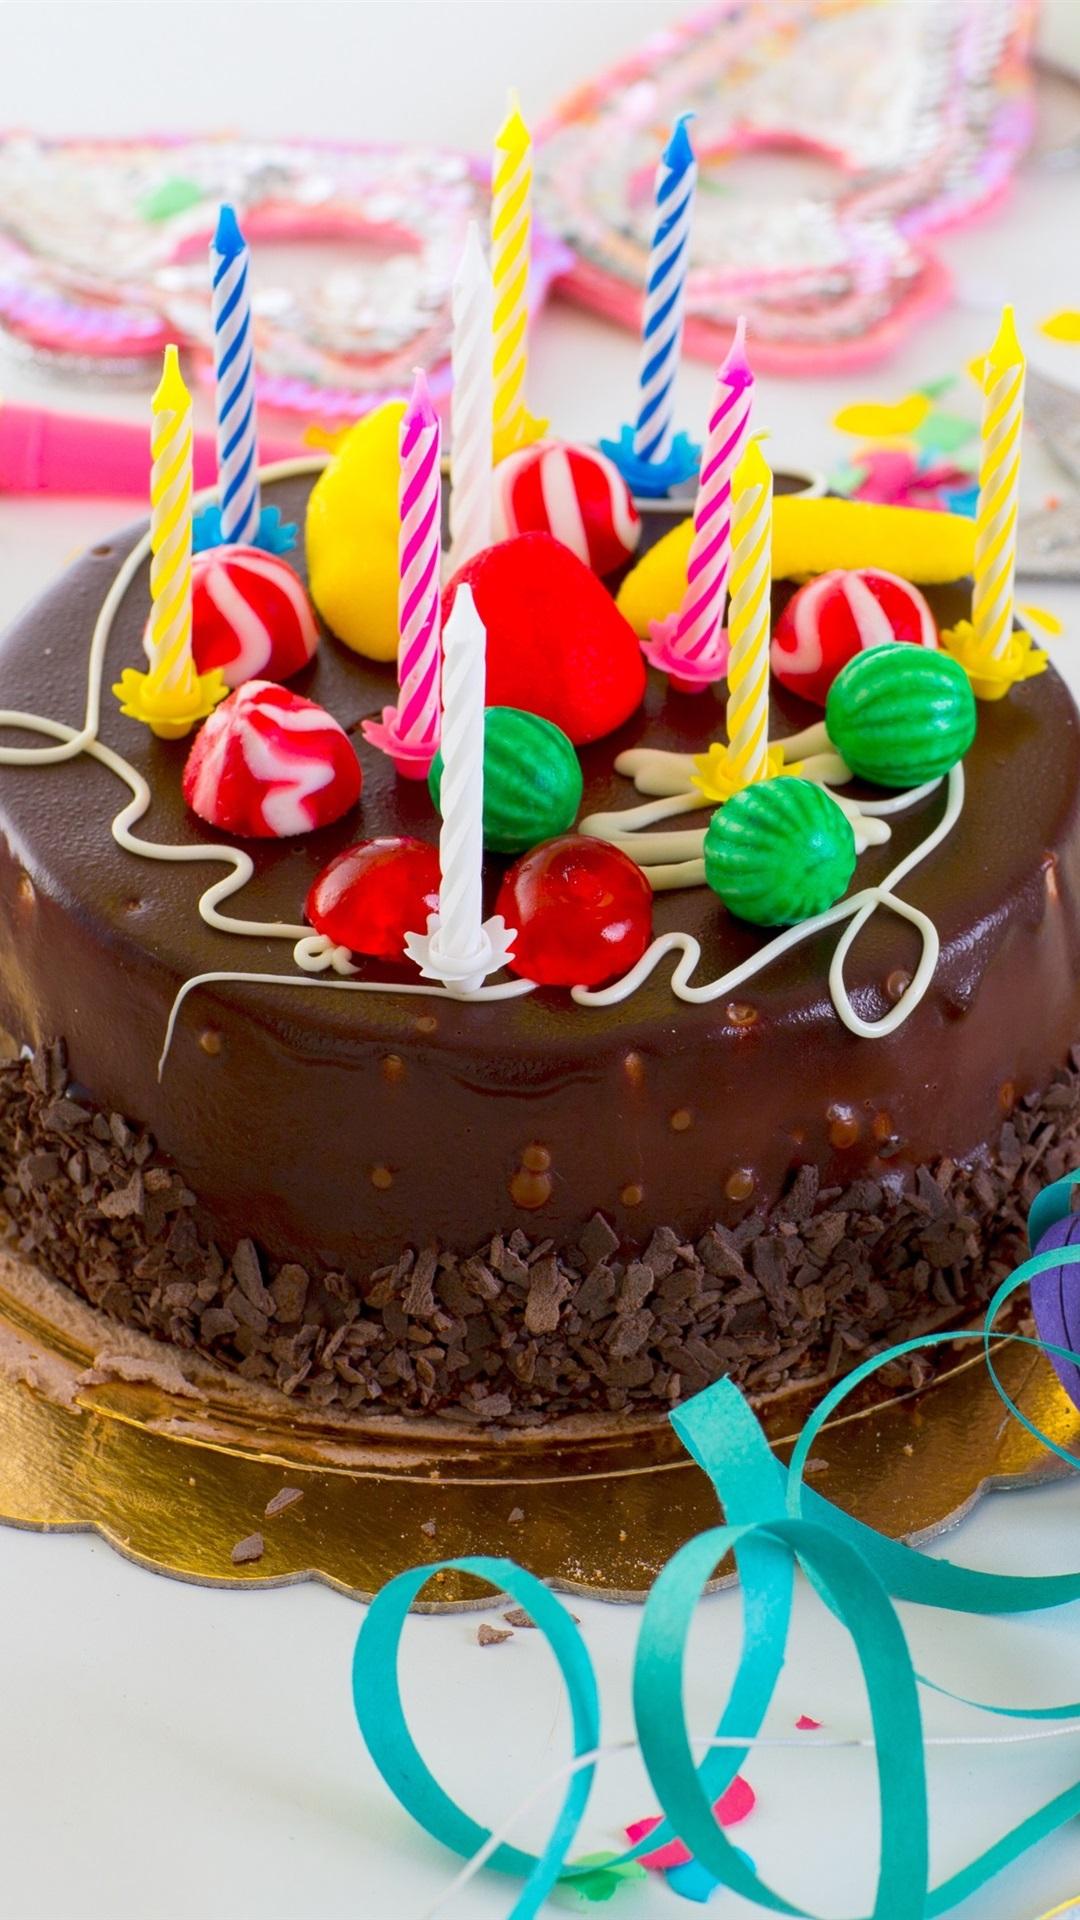 Wondrous Chocolate Cake Happy Birthday Candles Colored Ribbon 1080X1920 Personalised Birthday Cards Veneteletsinfo